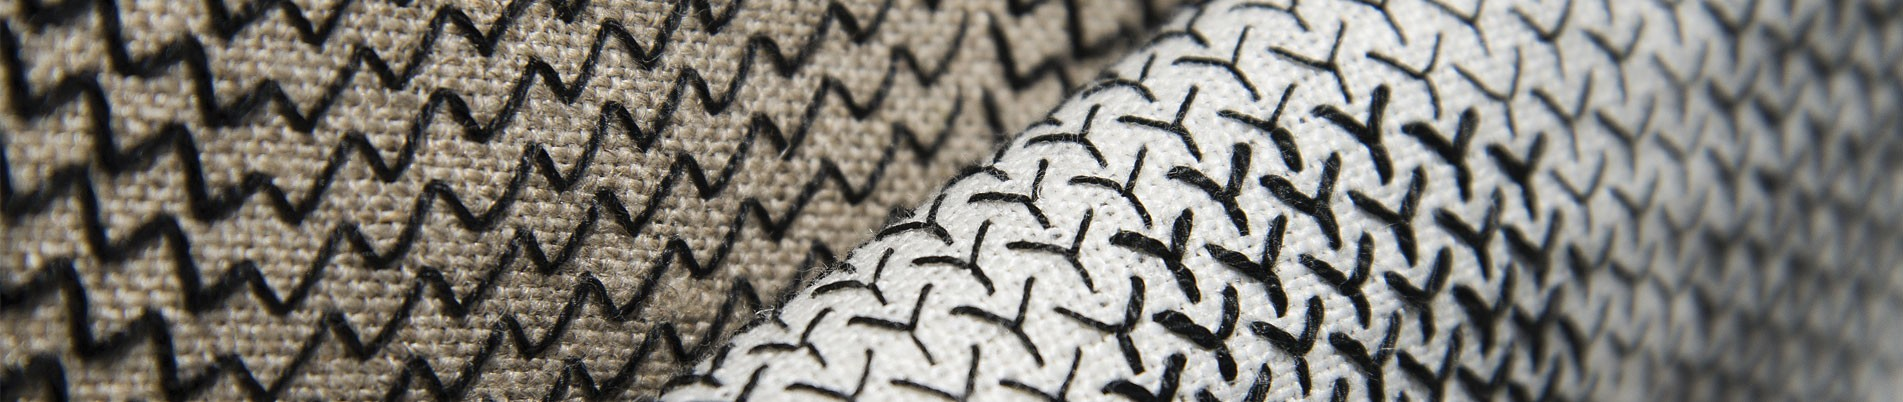 Handmade embroidered cushions